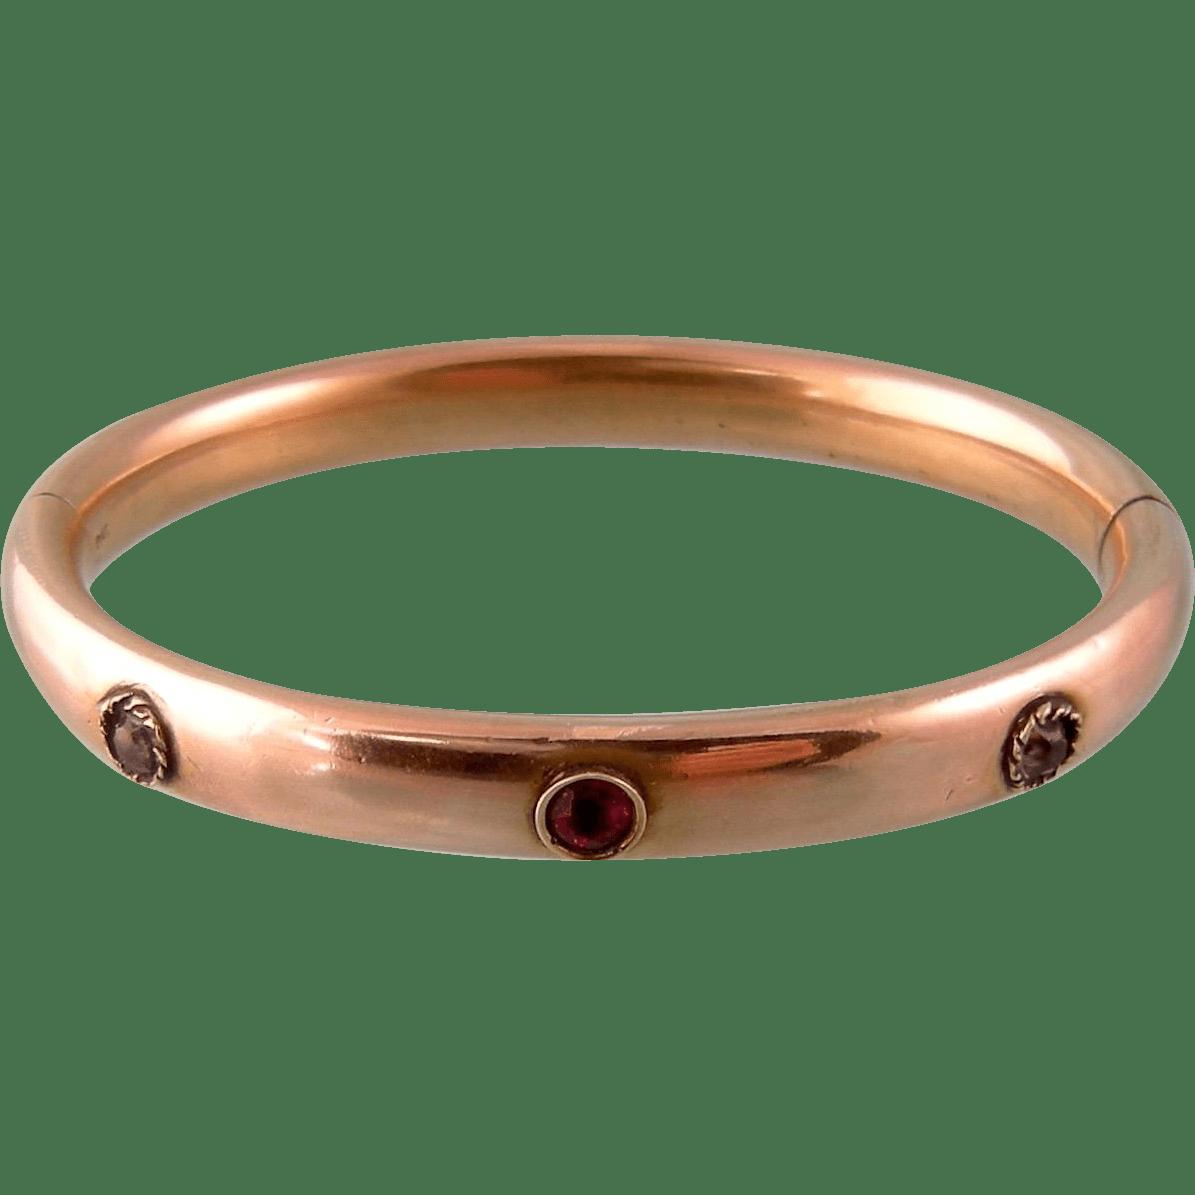 Antique Bangle Bracelet With Garnet And Diamond Paste